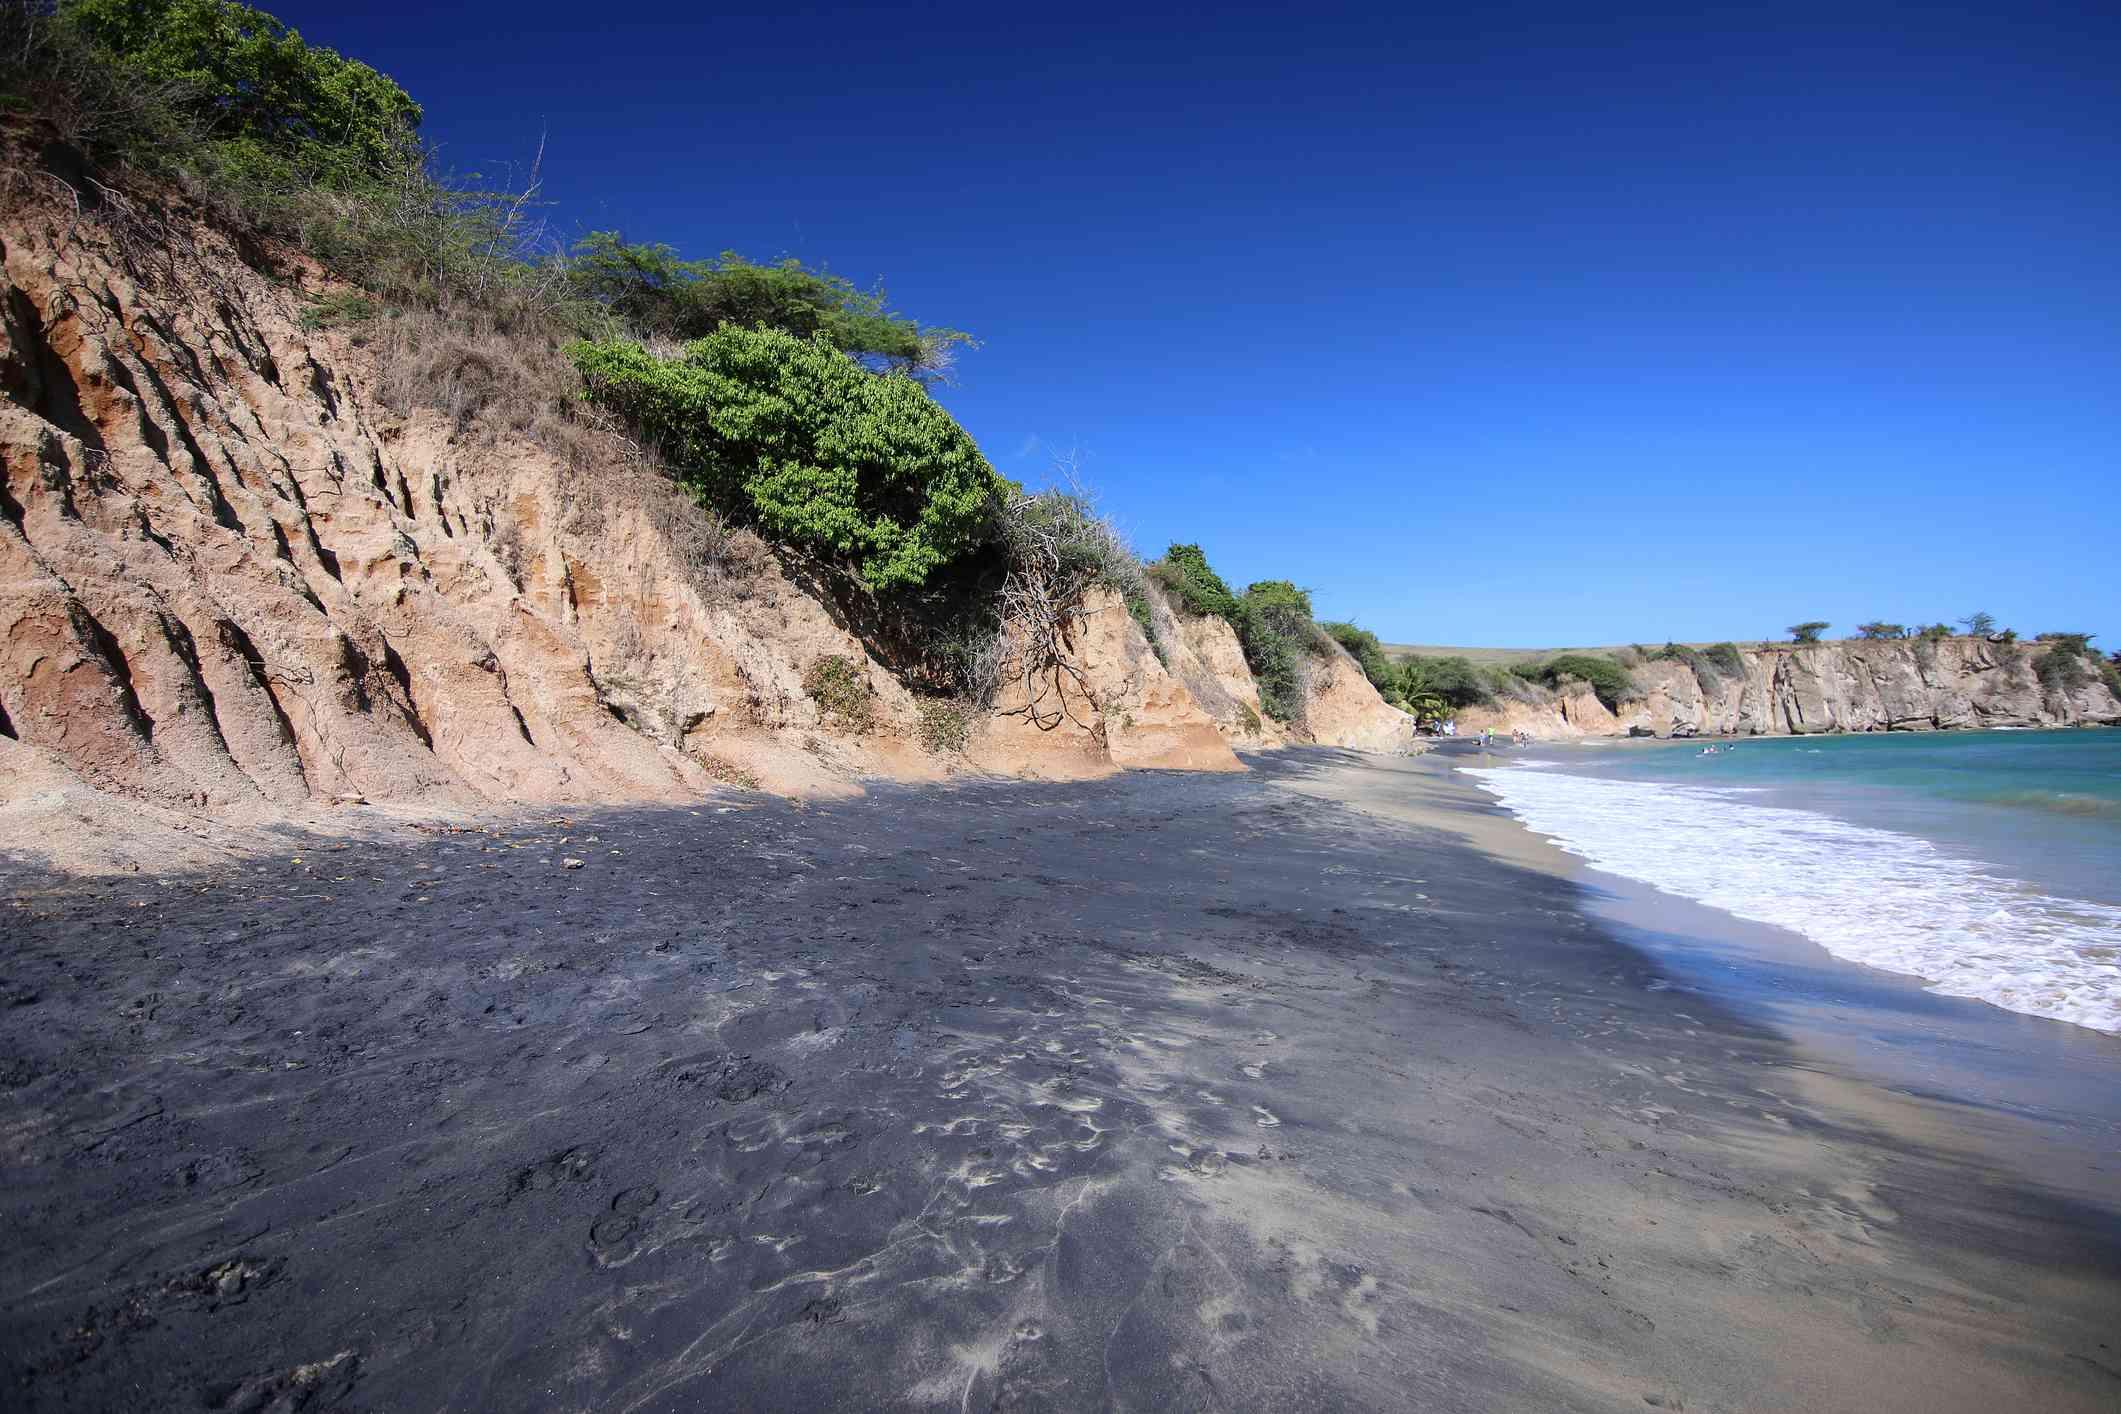 Black Sand Beach (Playa Negra), Vieques, Puerto Rico